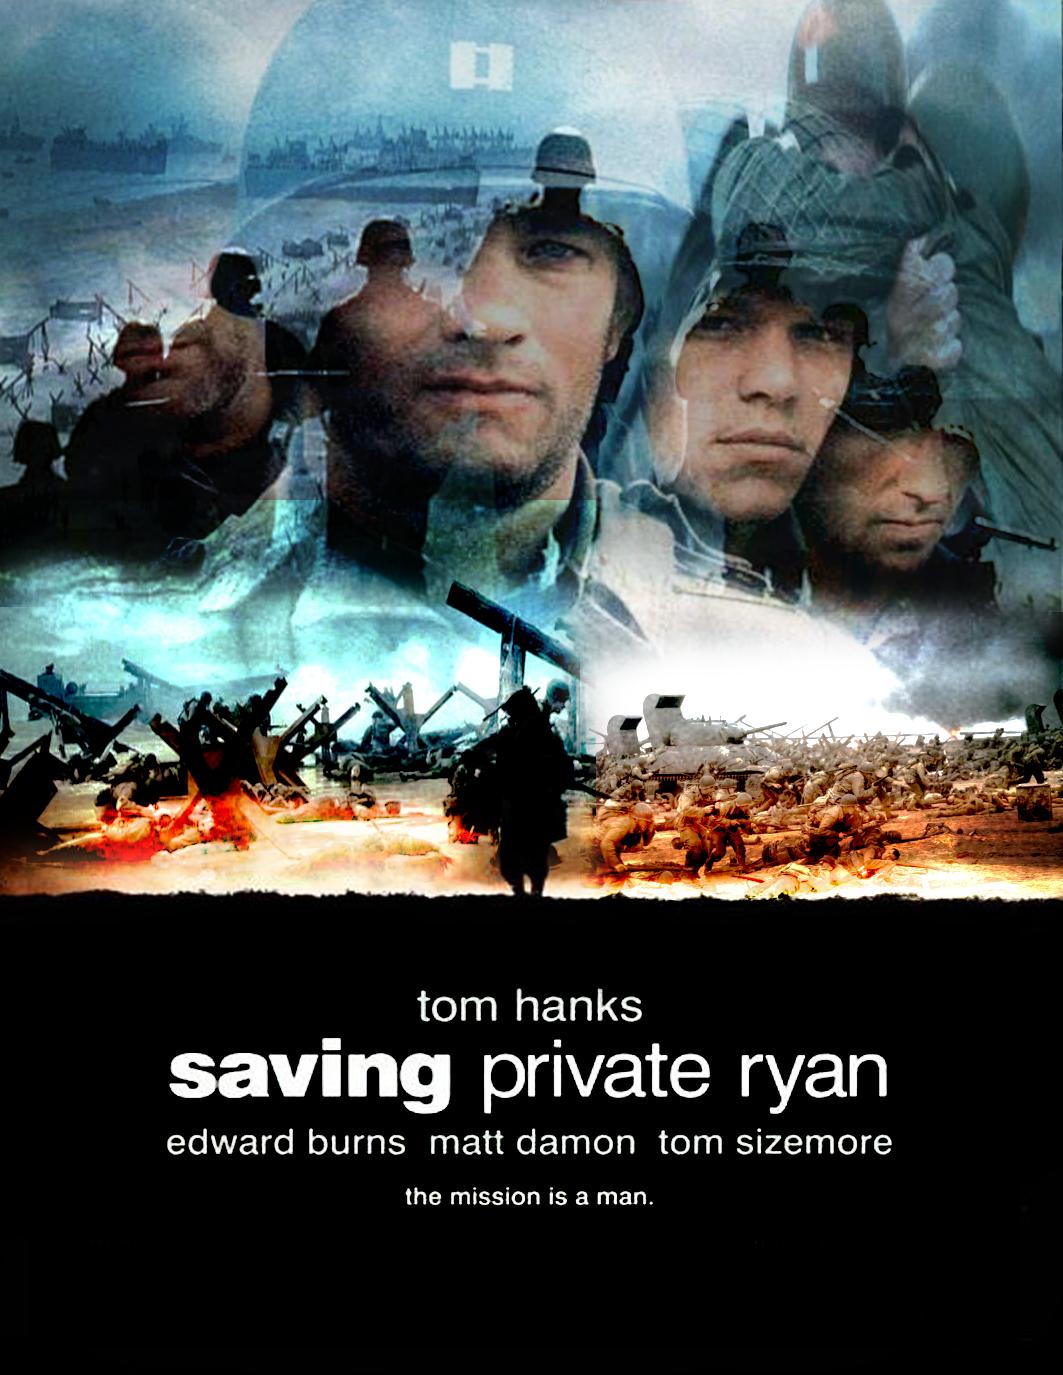 http://3.bp.blogspot.com/-5Z06o3o7JYI/T8o6zDDiuTI/AAAAAAAAAoE/gX9qYwKpS_8/s1600/Saving-Private-Ryan.jpg